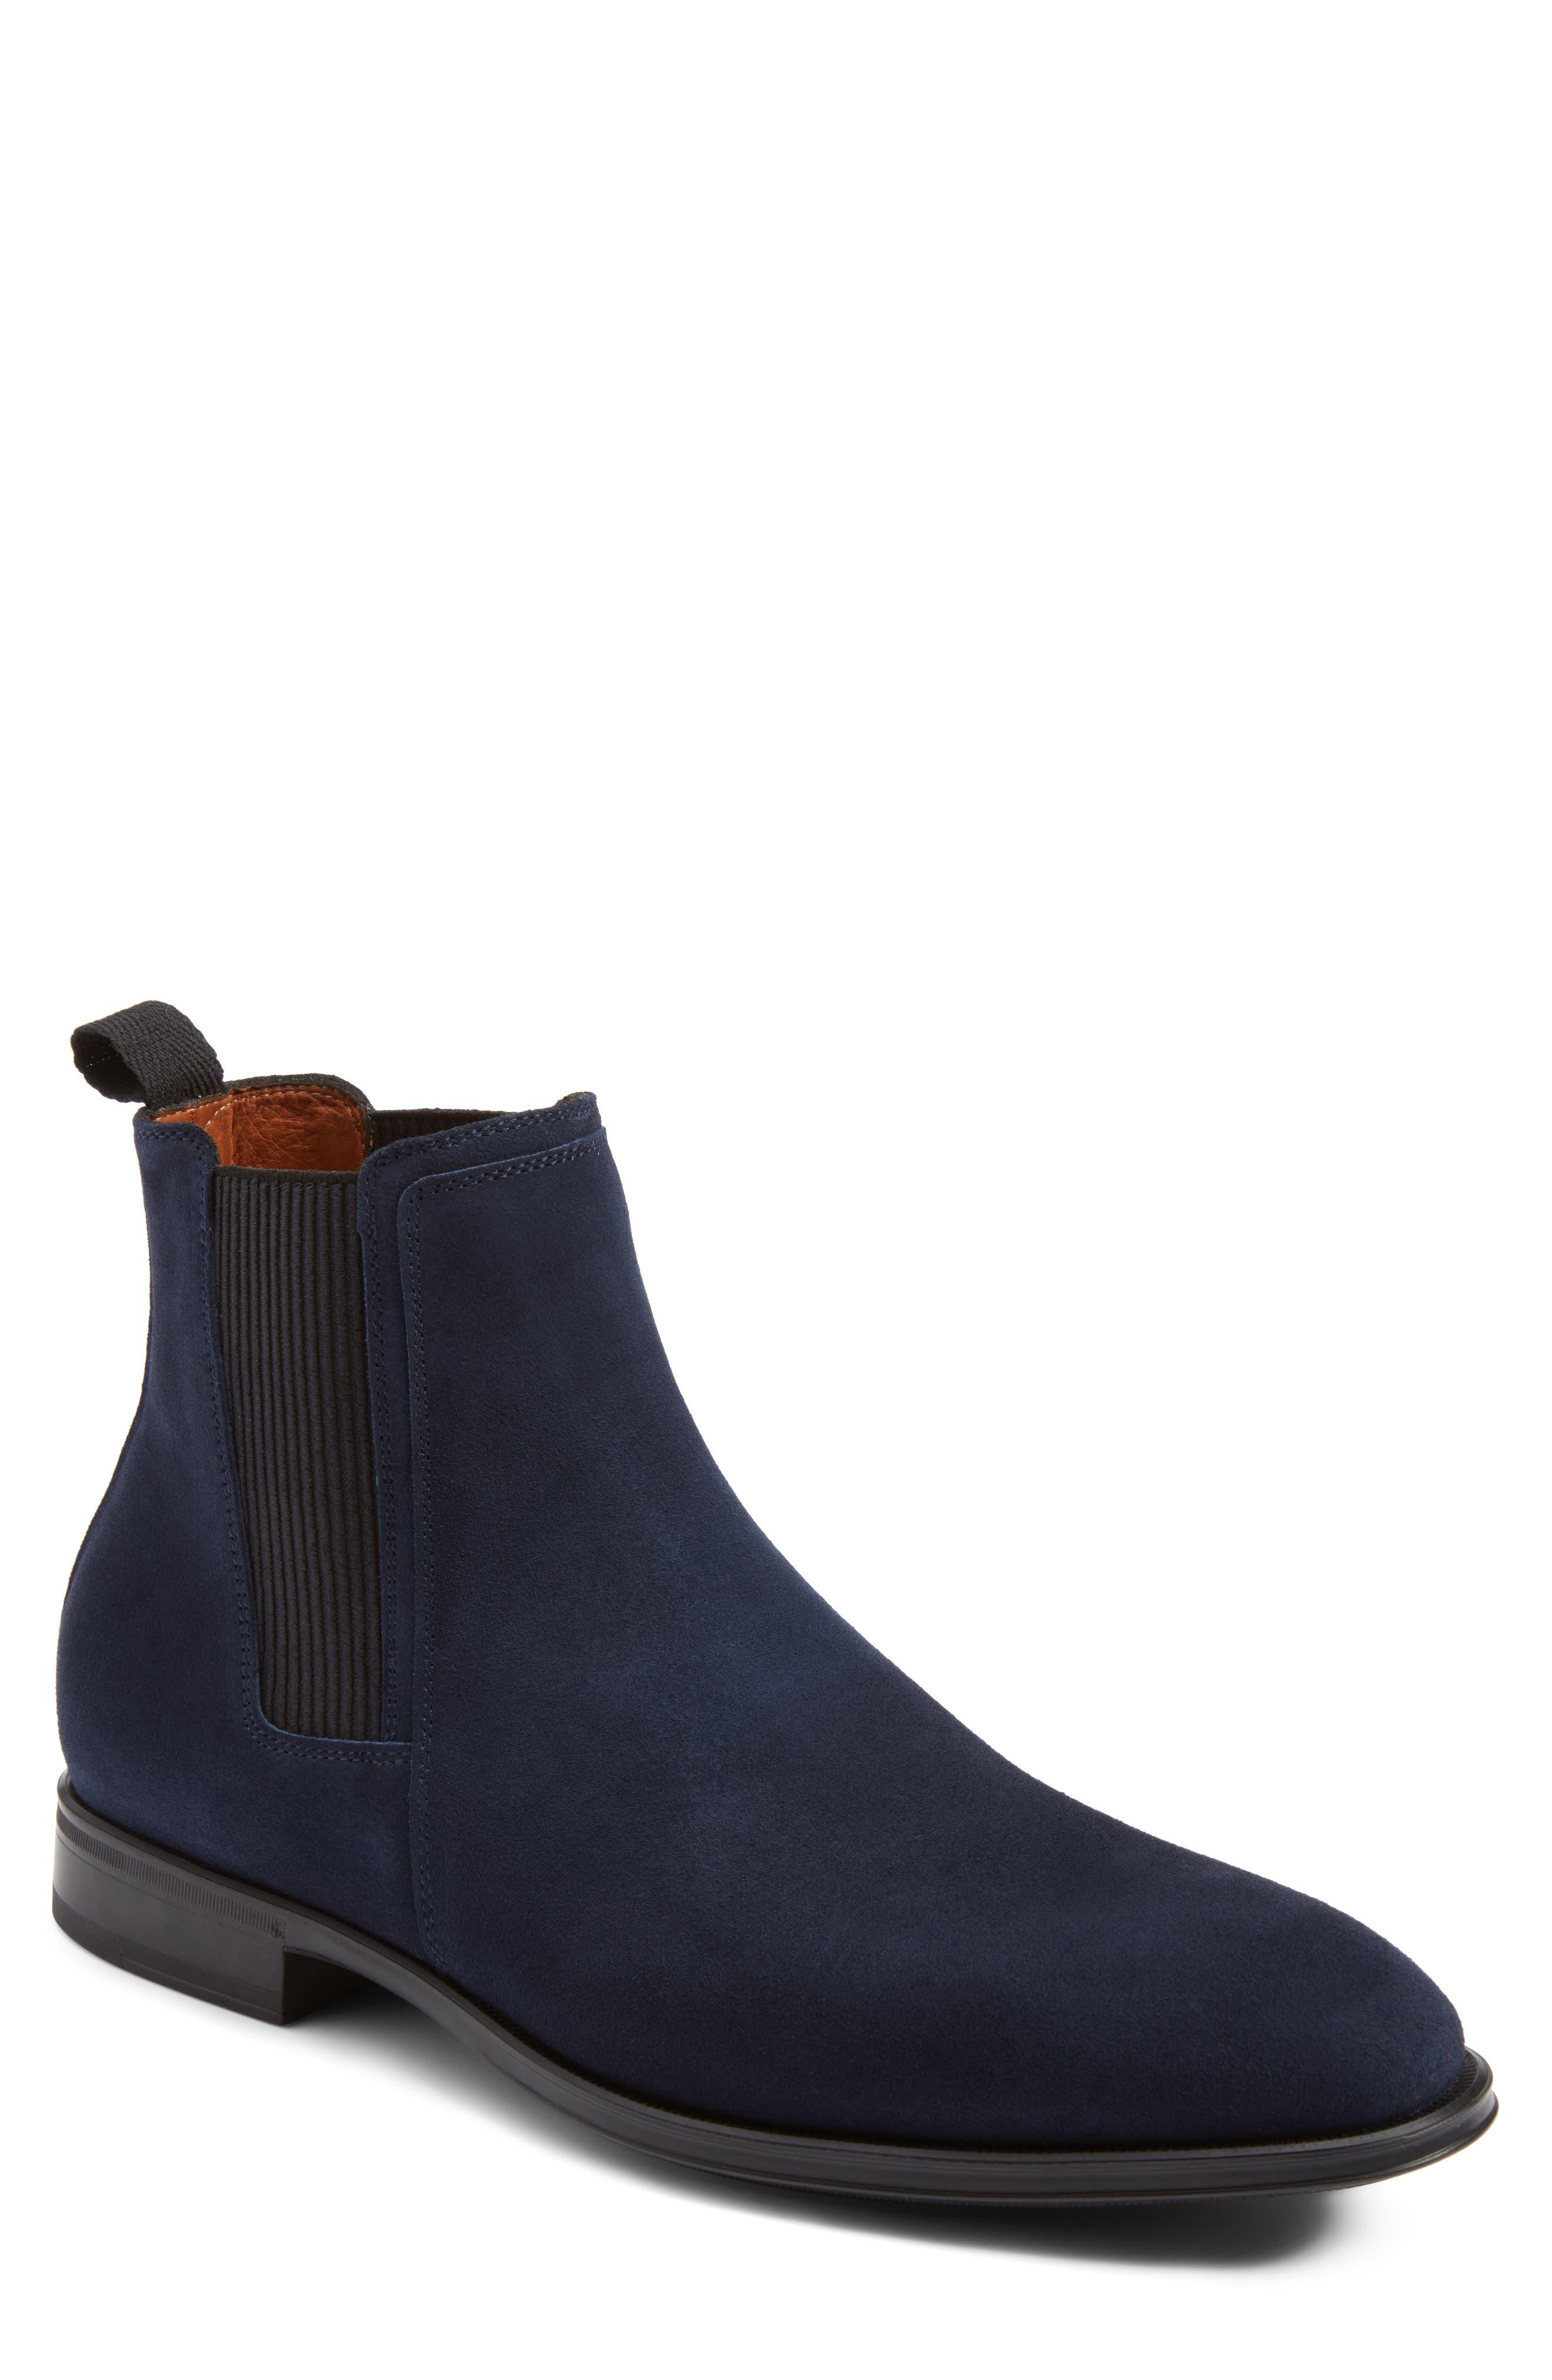 Alternate Image 1 Selected - Aquatalia Damon Chelsea Boot (Men)